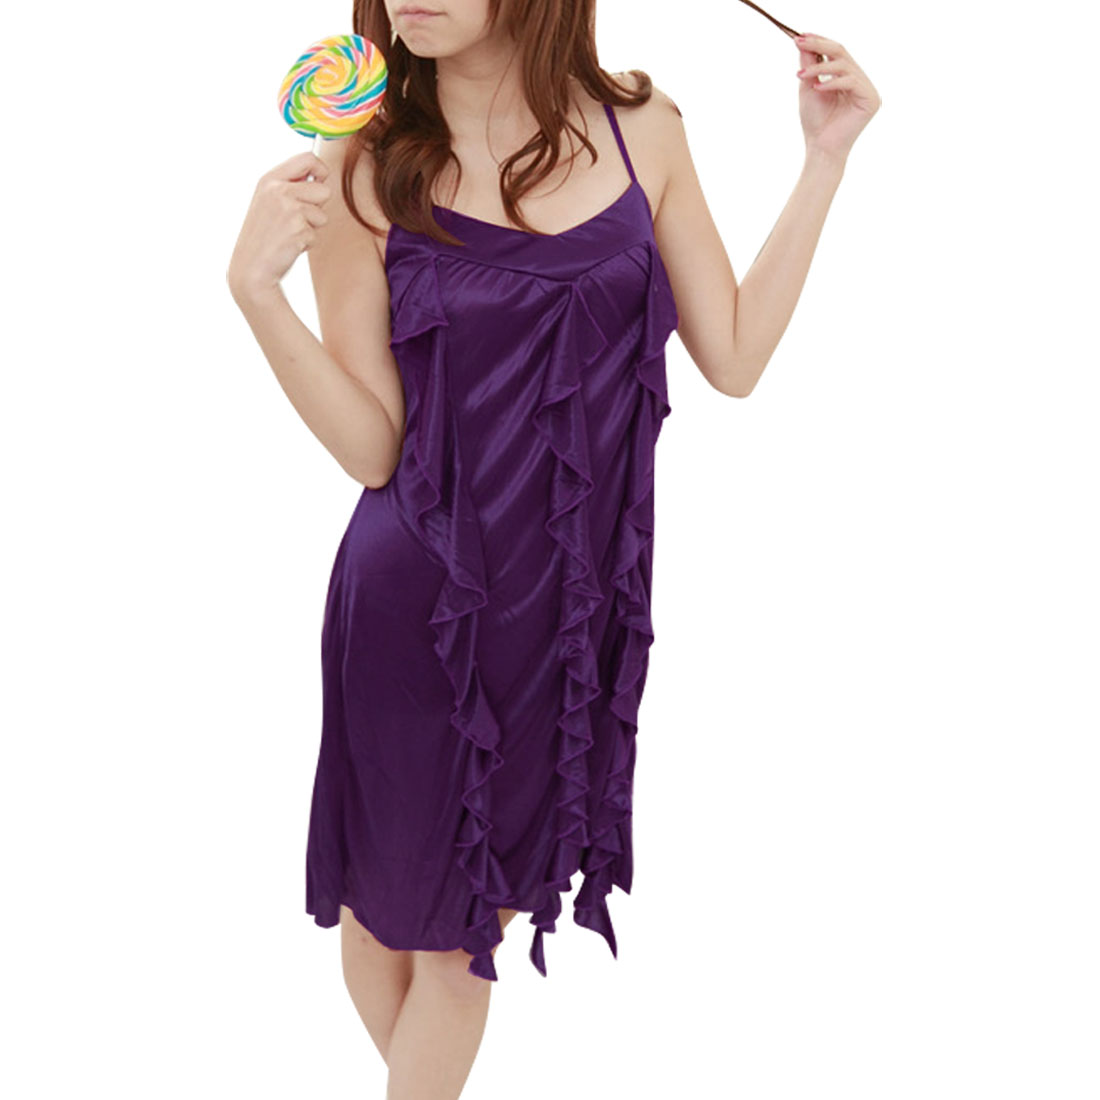 Ladies Flounce Front Spaghetti Strap Stretchy Babydoll Sleepwear Purple XS